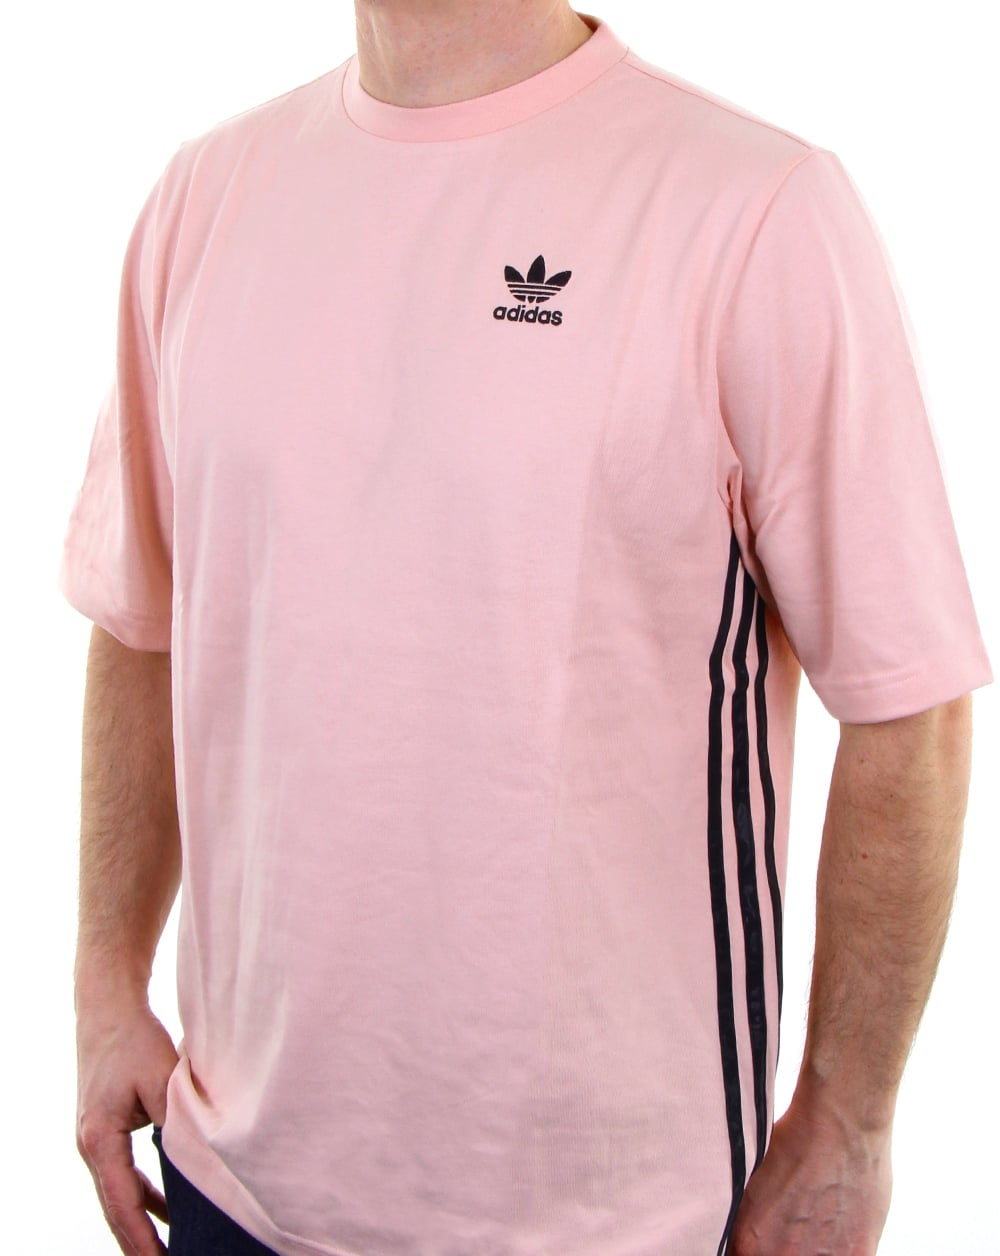 Adidas pink t shirt mens l d for Mens pink shirts uk